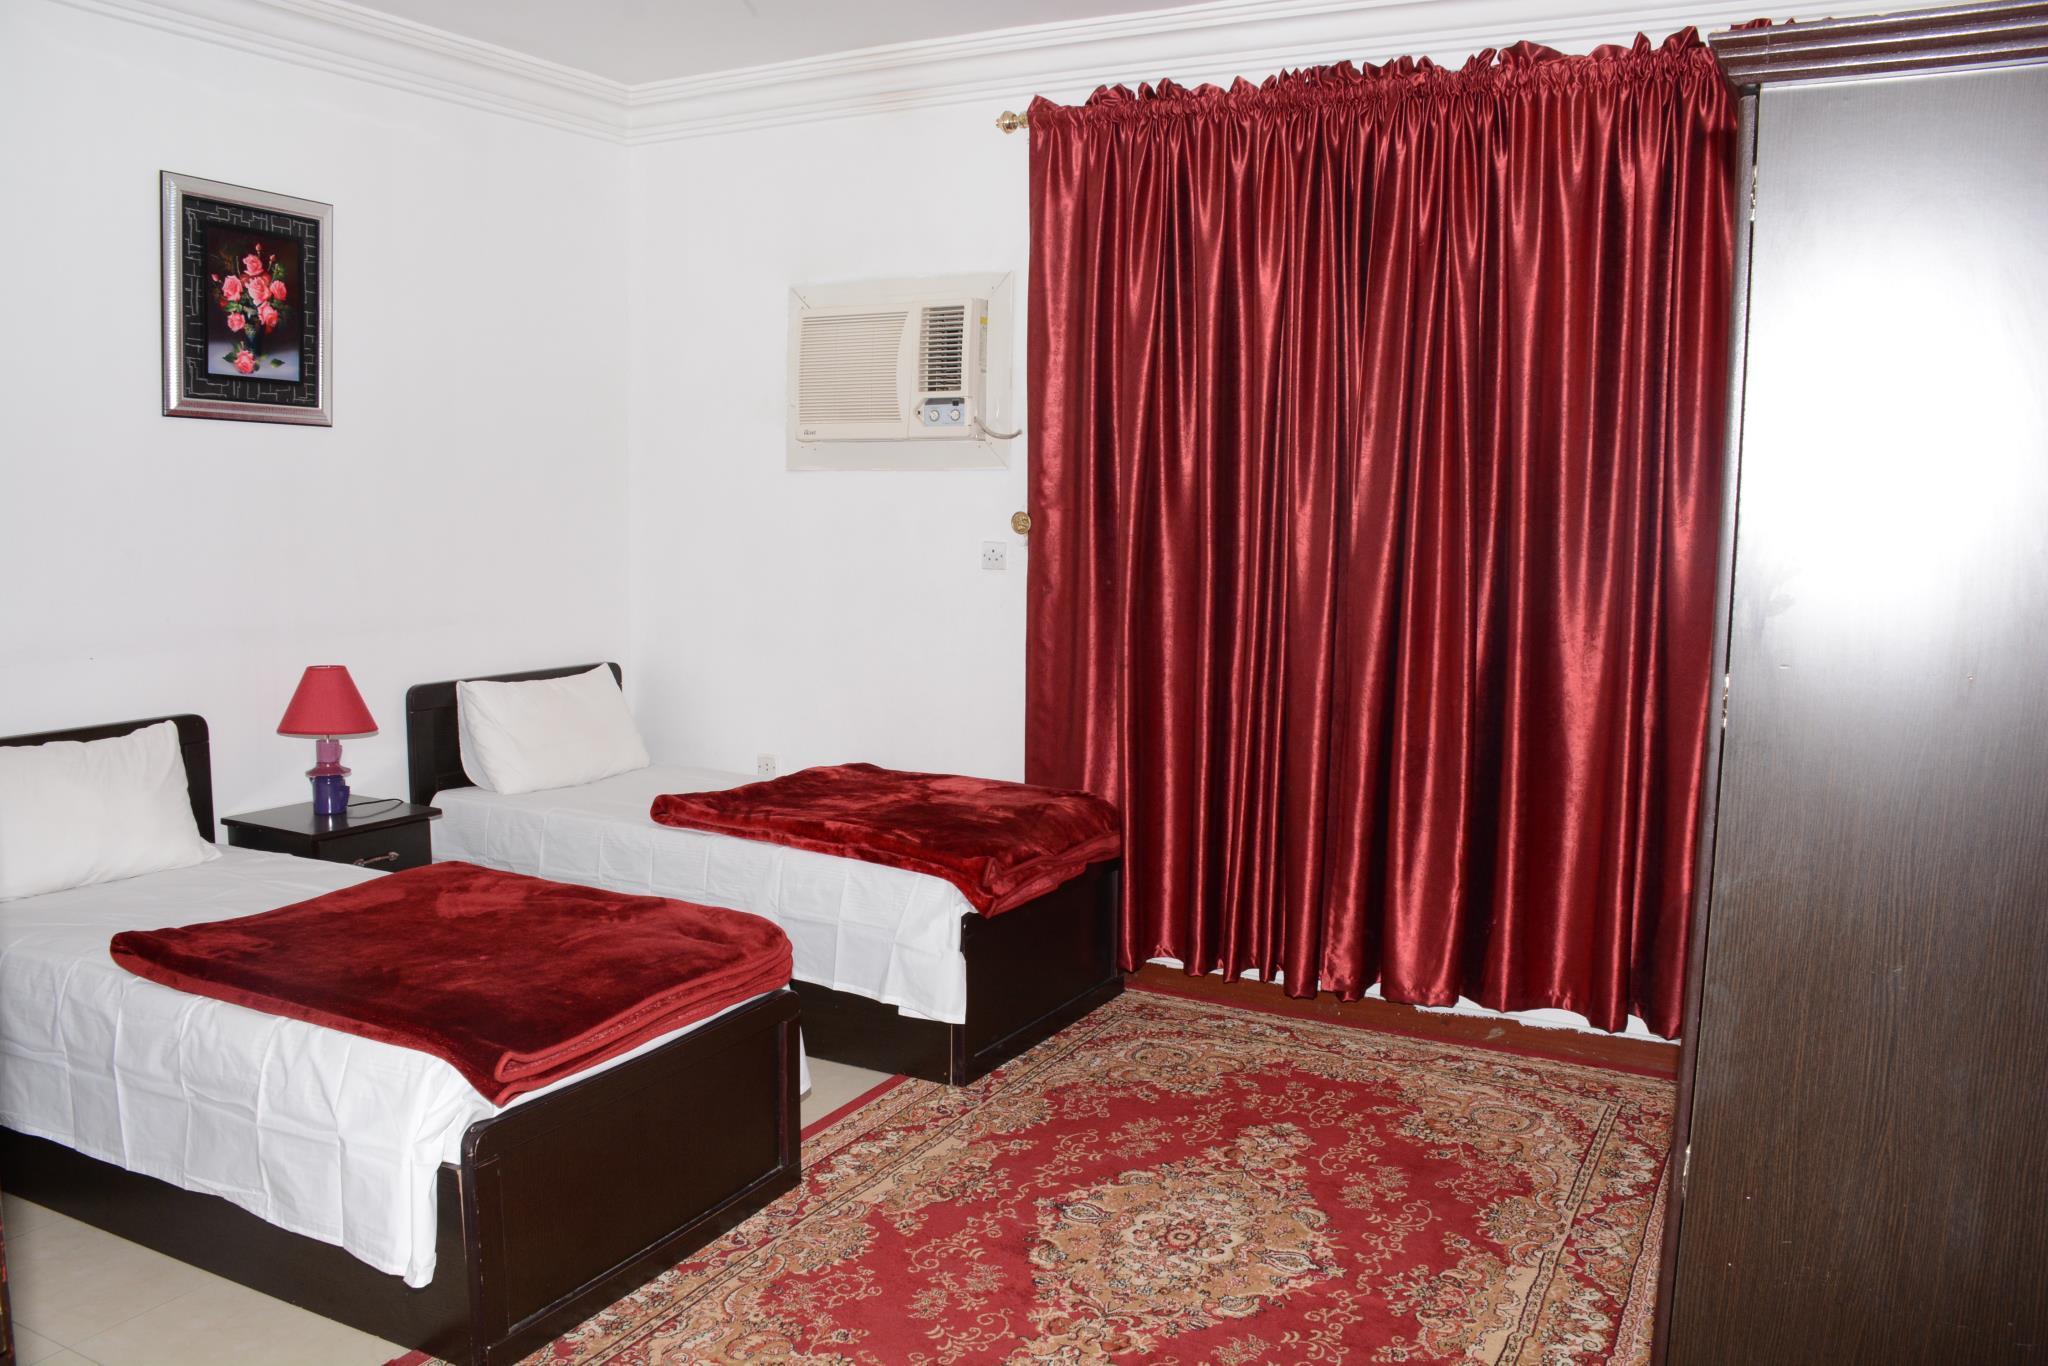 Al Eairy Apartments Madinah 2